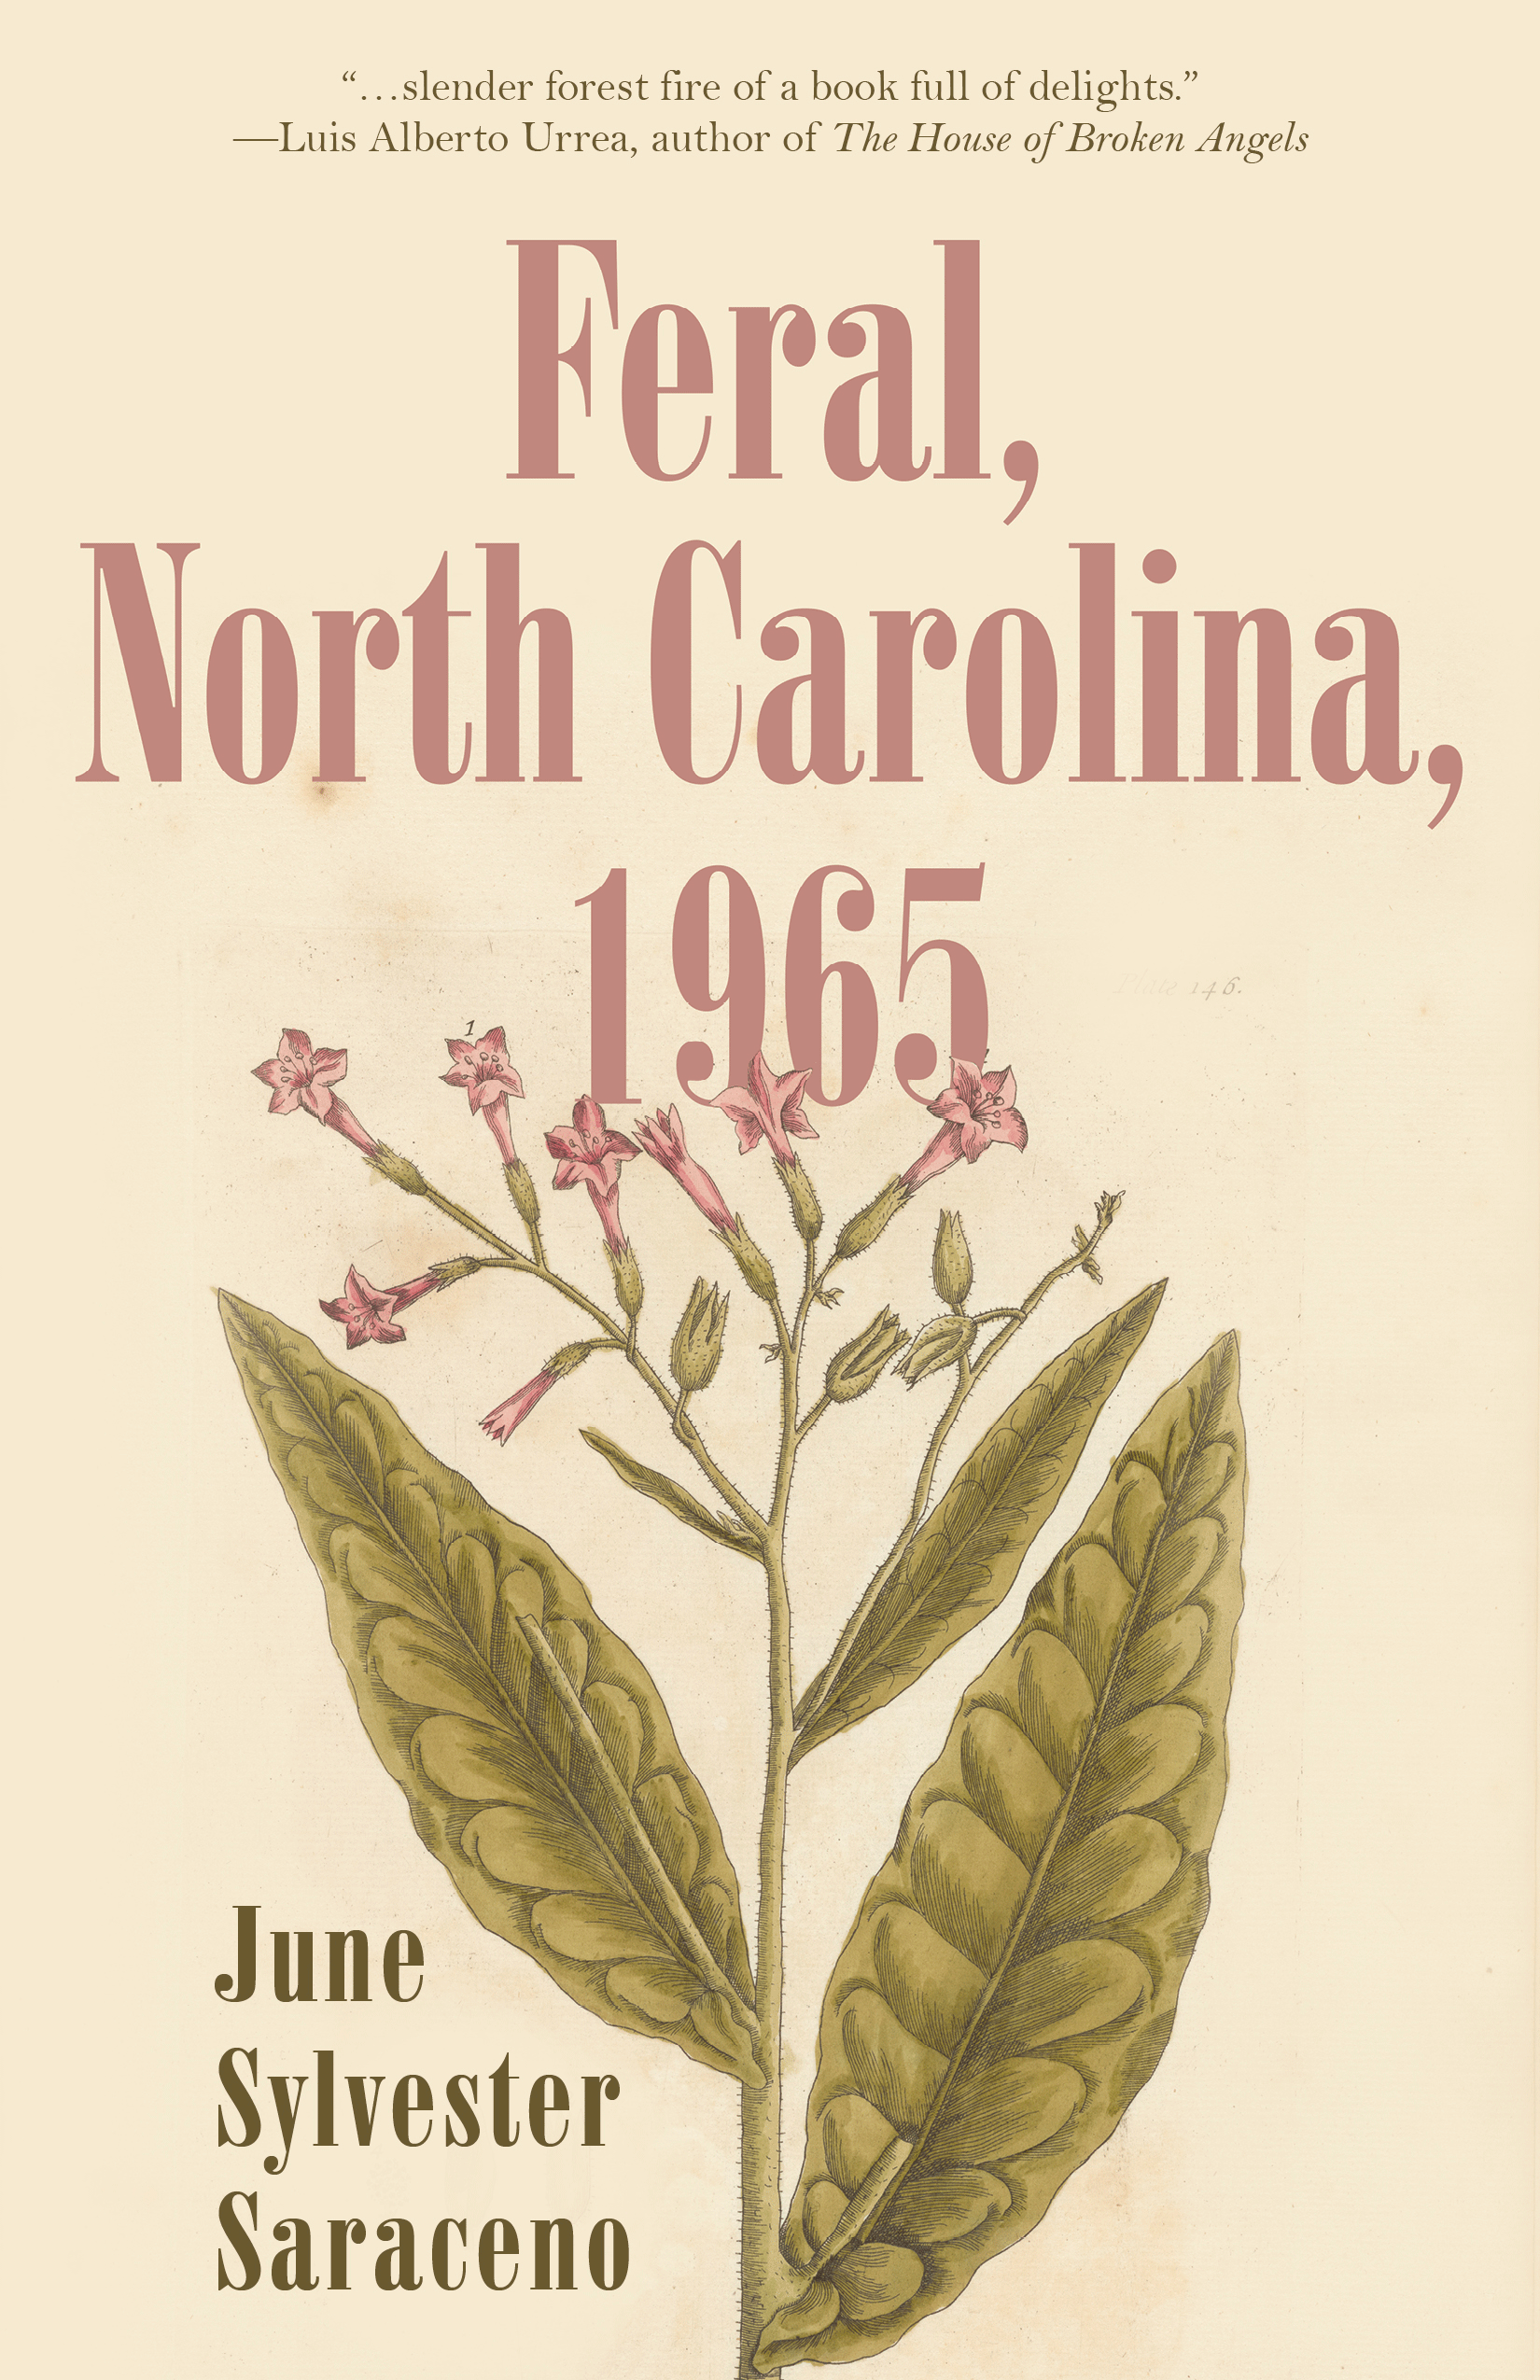 Feral, North Carolina, 1965 by June Sylvester Saraceno